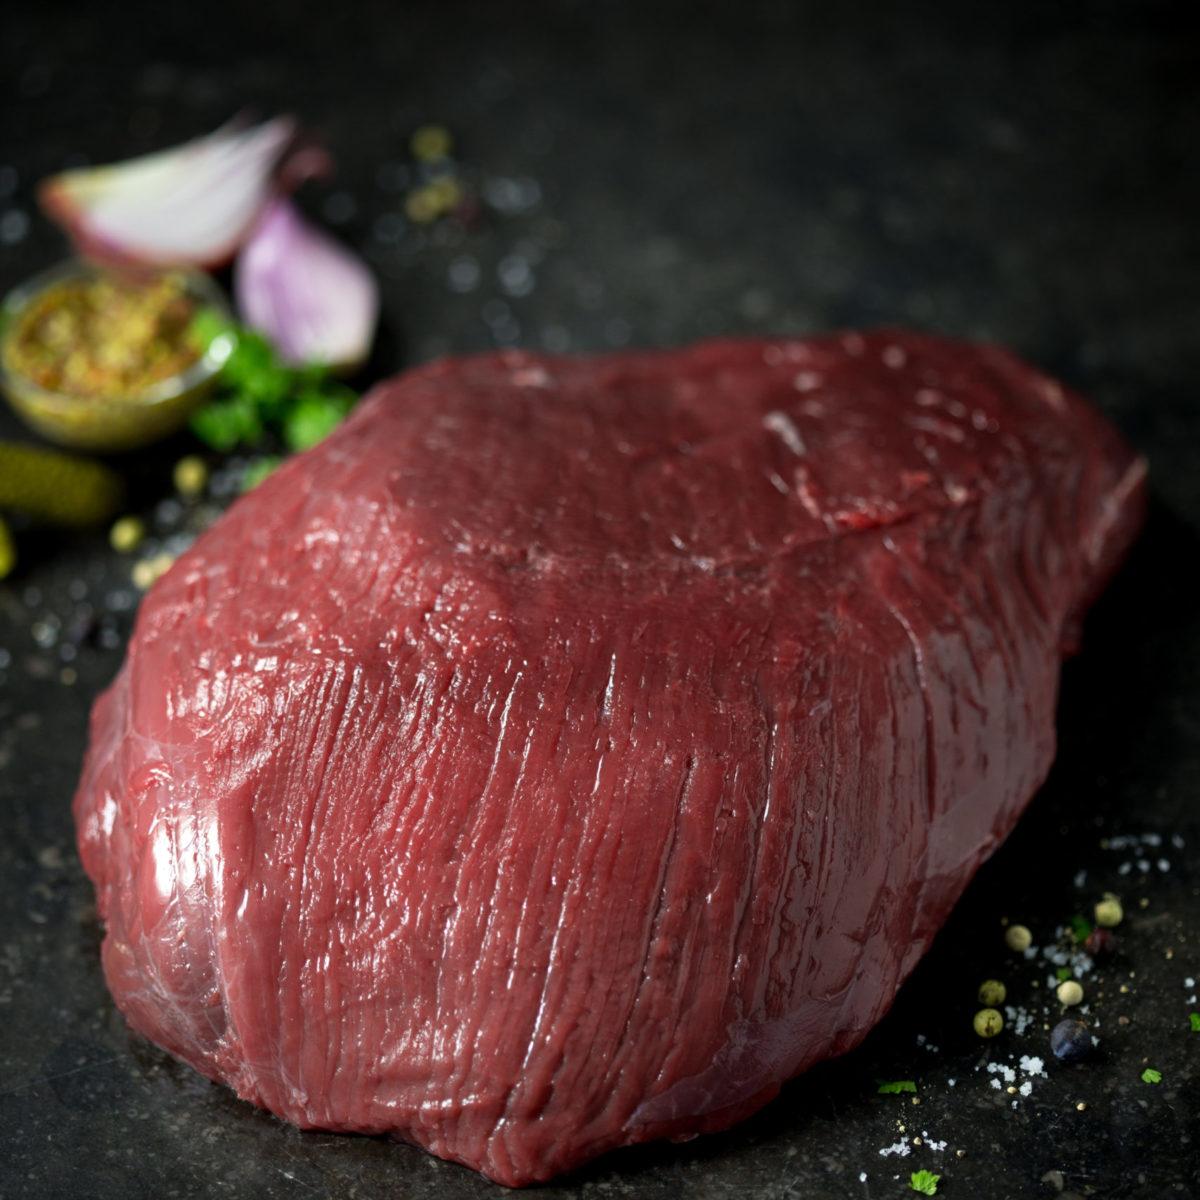 Coeur de rulsteak prolaidis